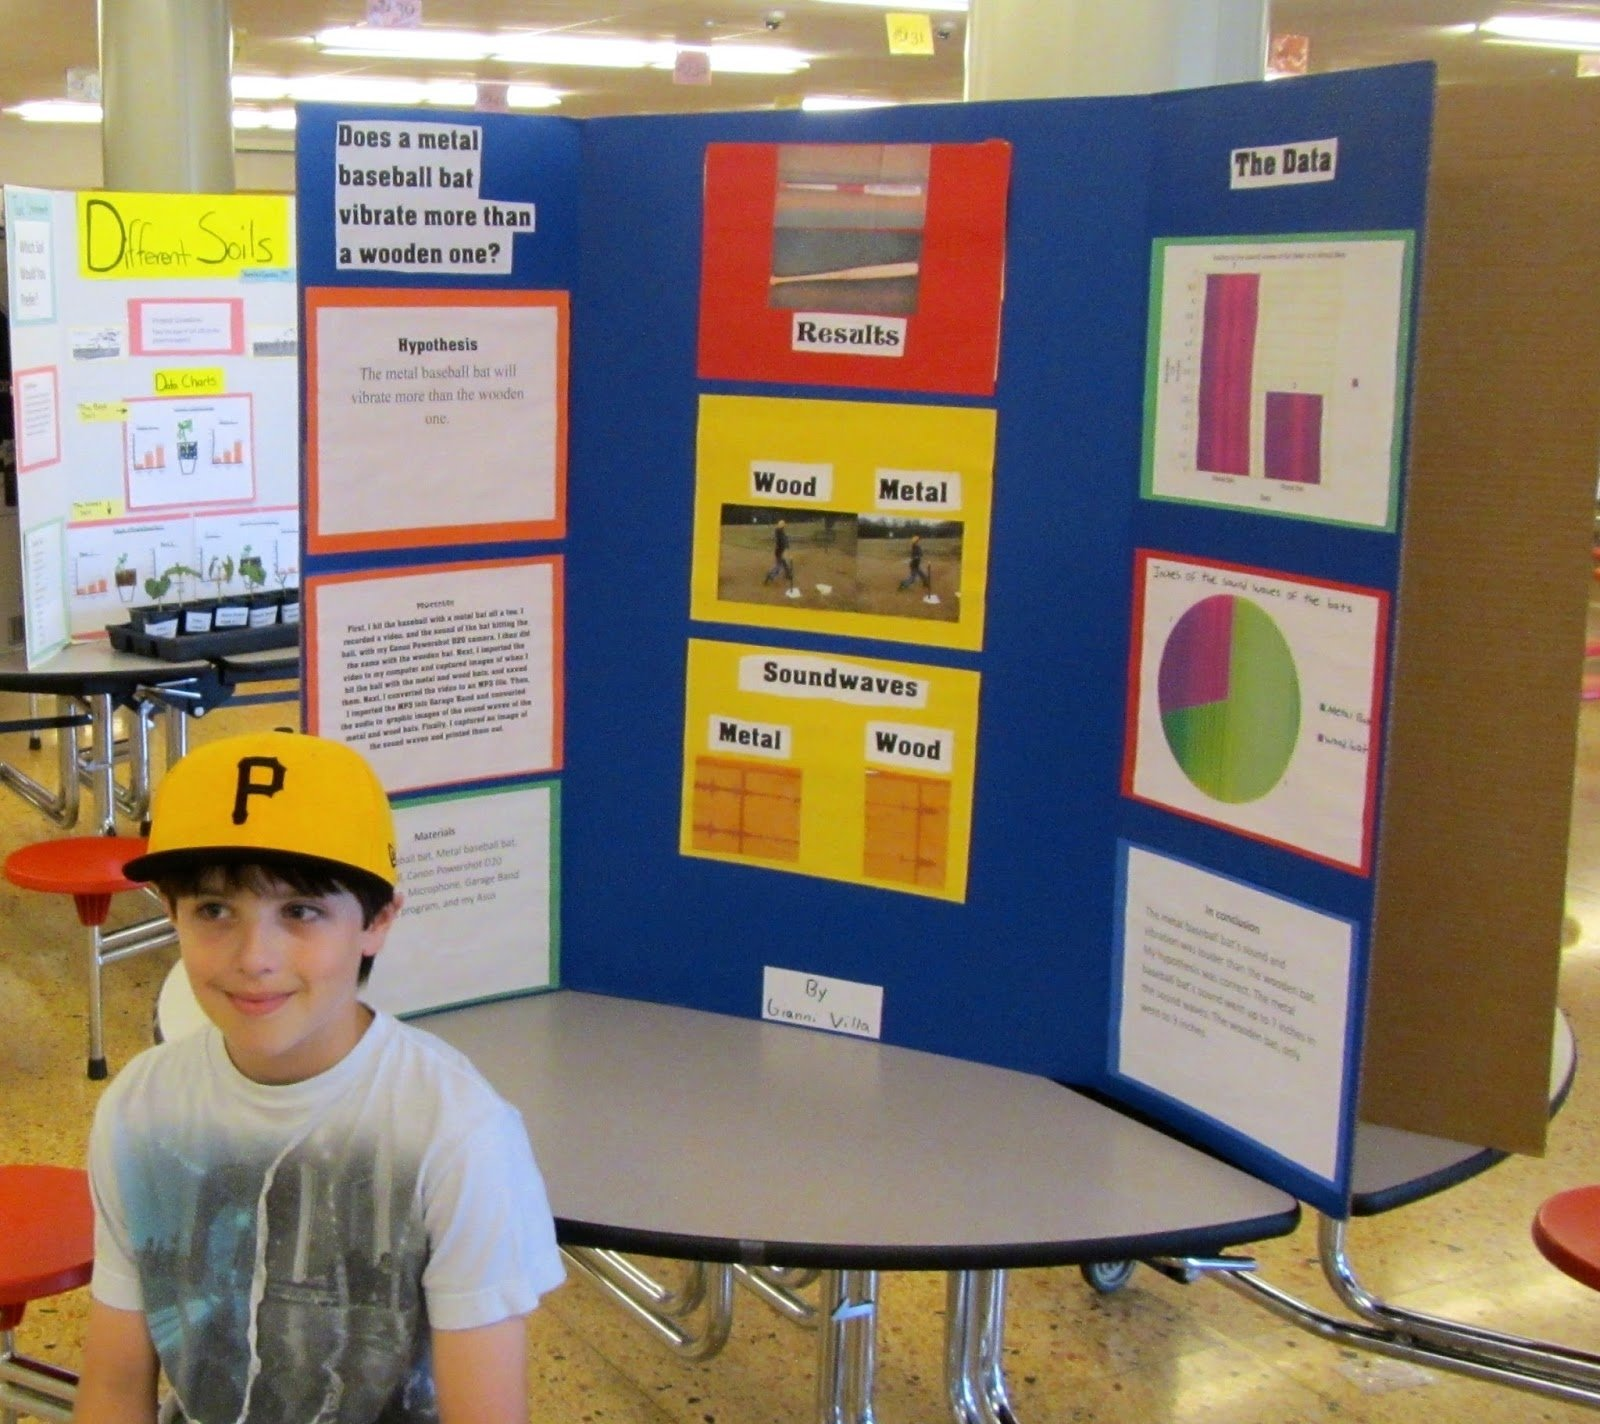 10 Best Science Fair Project Ideas List list of science projects college paper help txhomeworkzghp dedup 2 2020